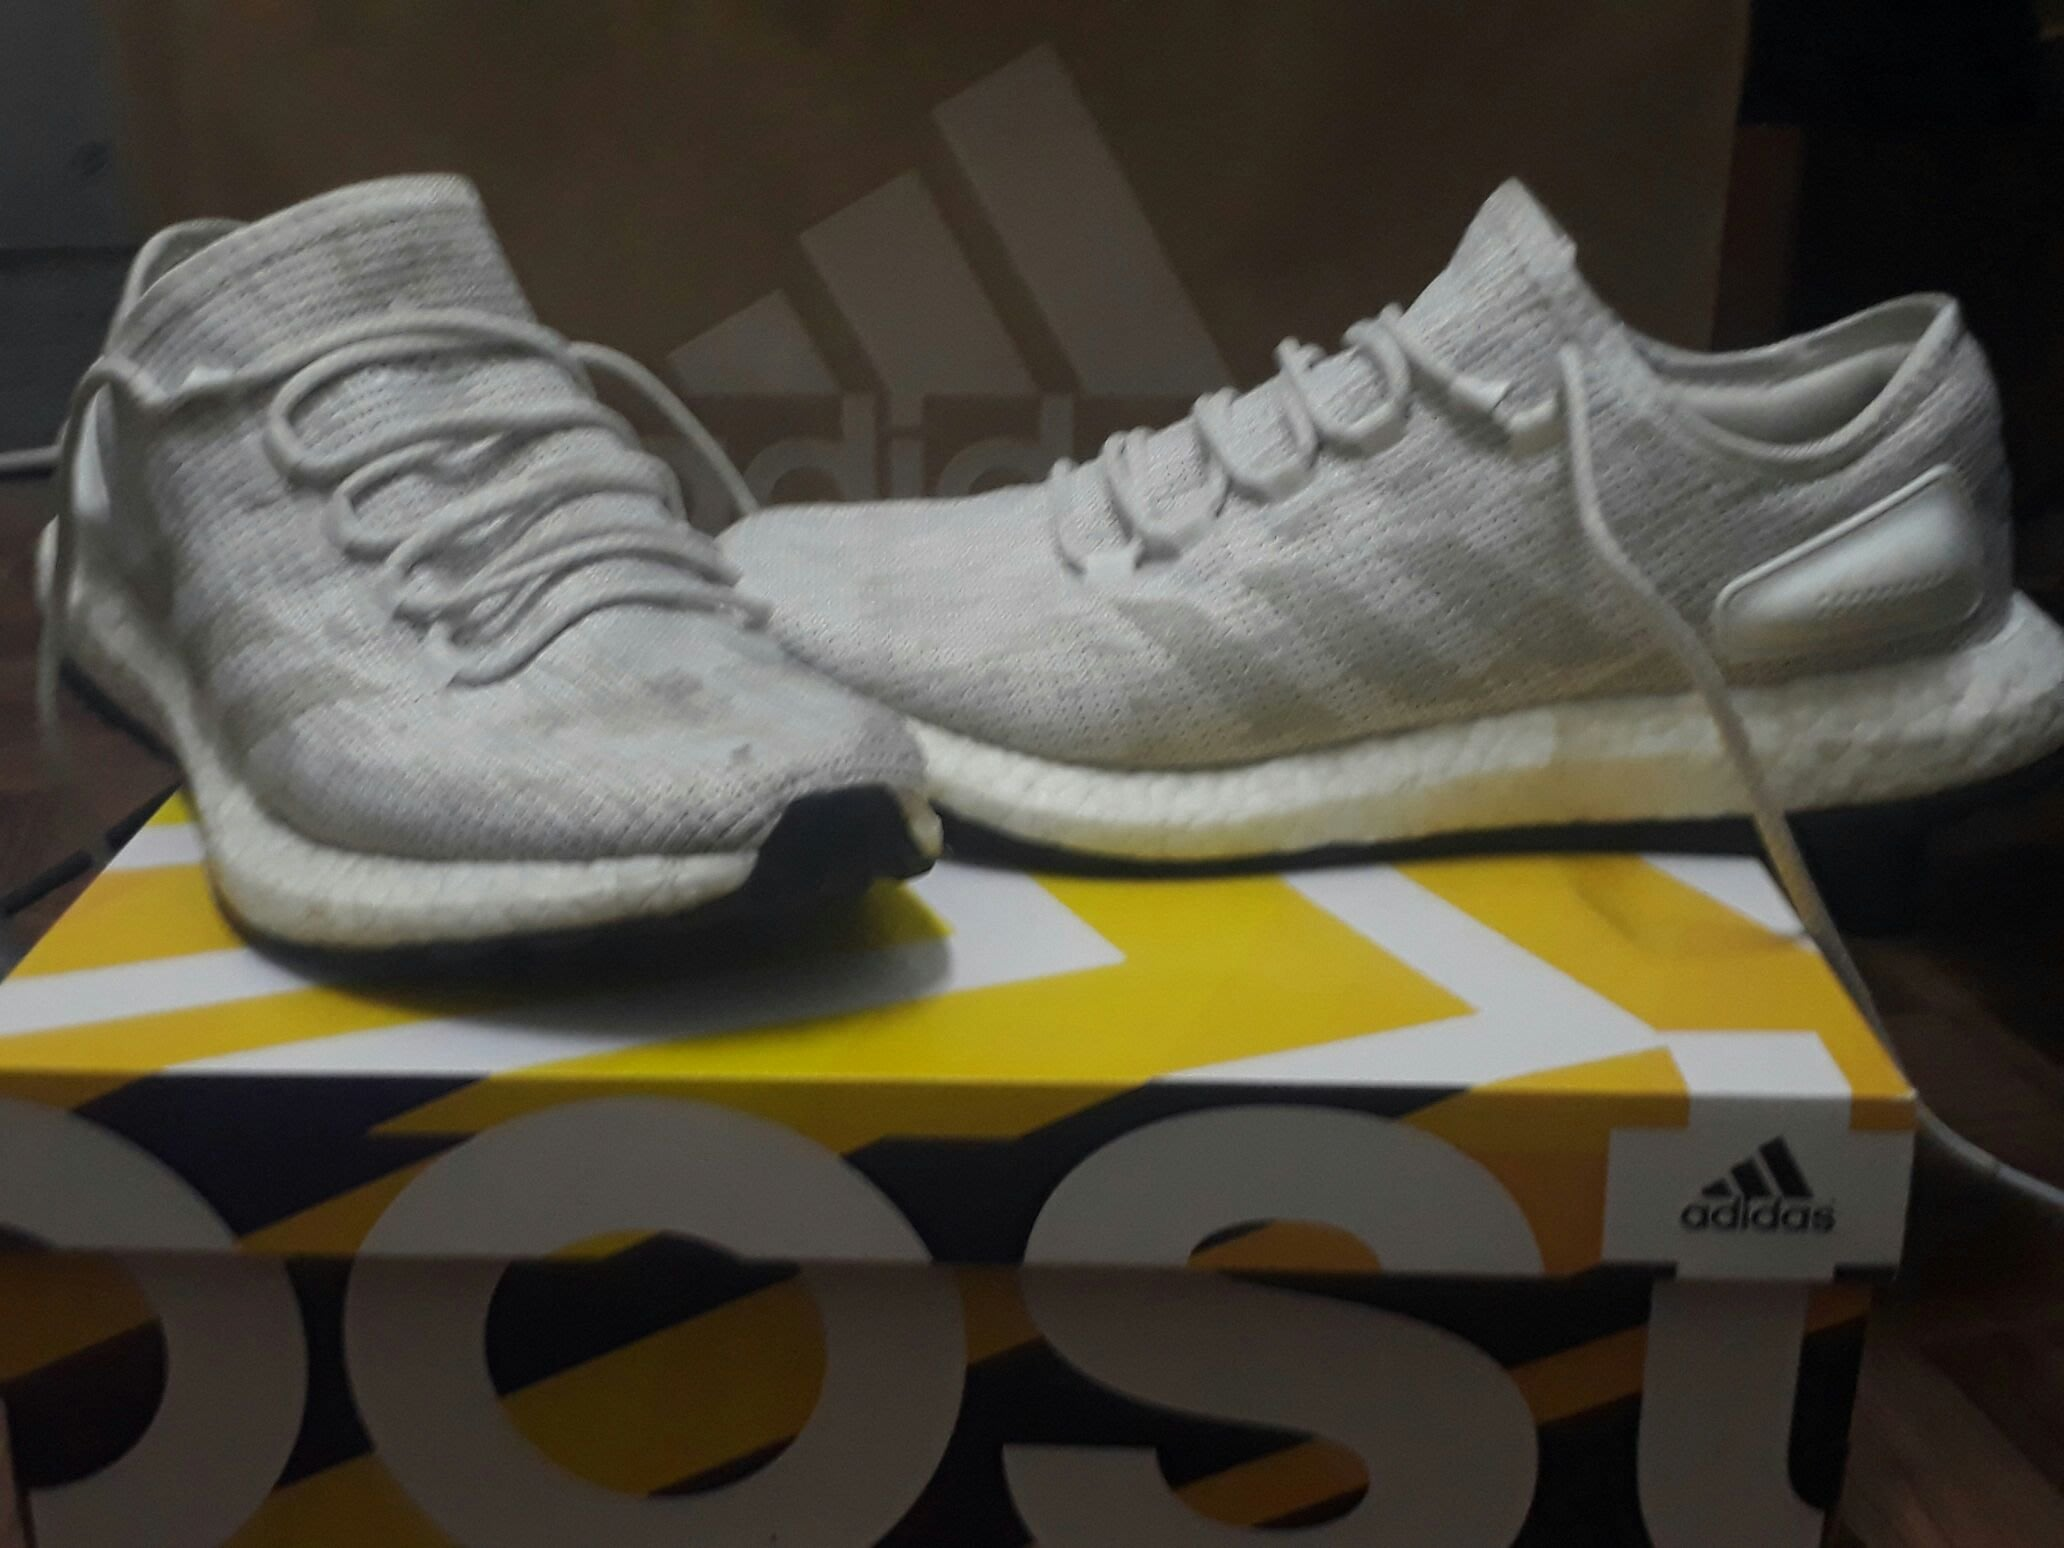 Adidas pure boost us10.5